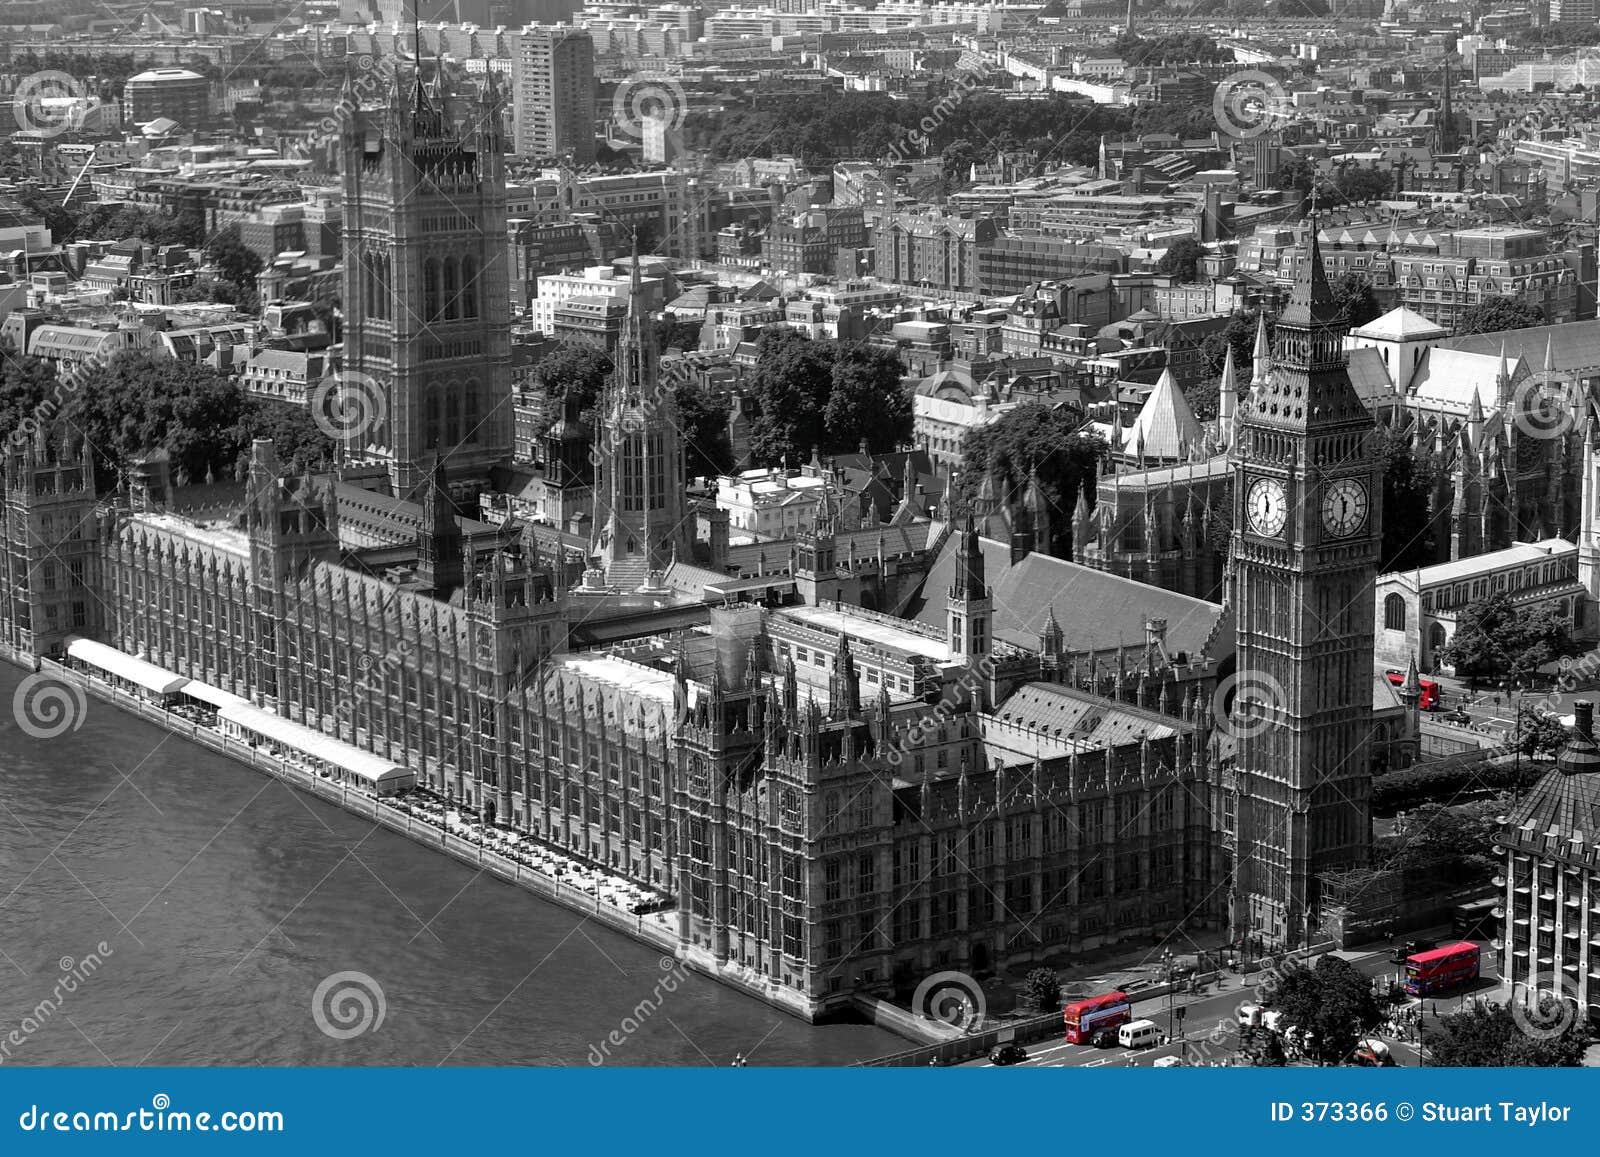 Rode Bussen in Westminster